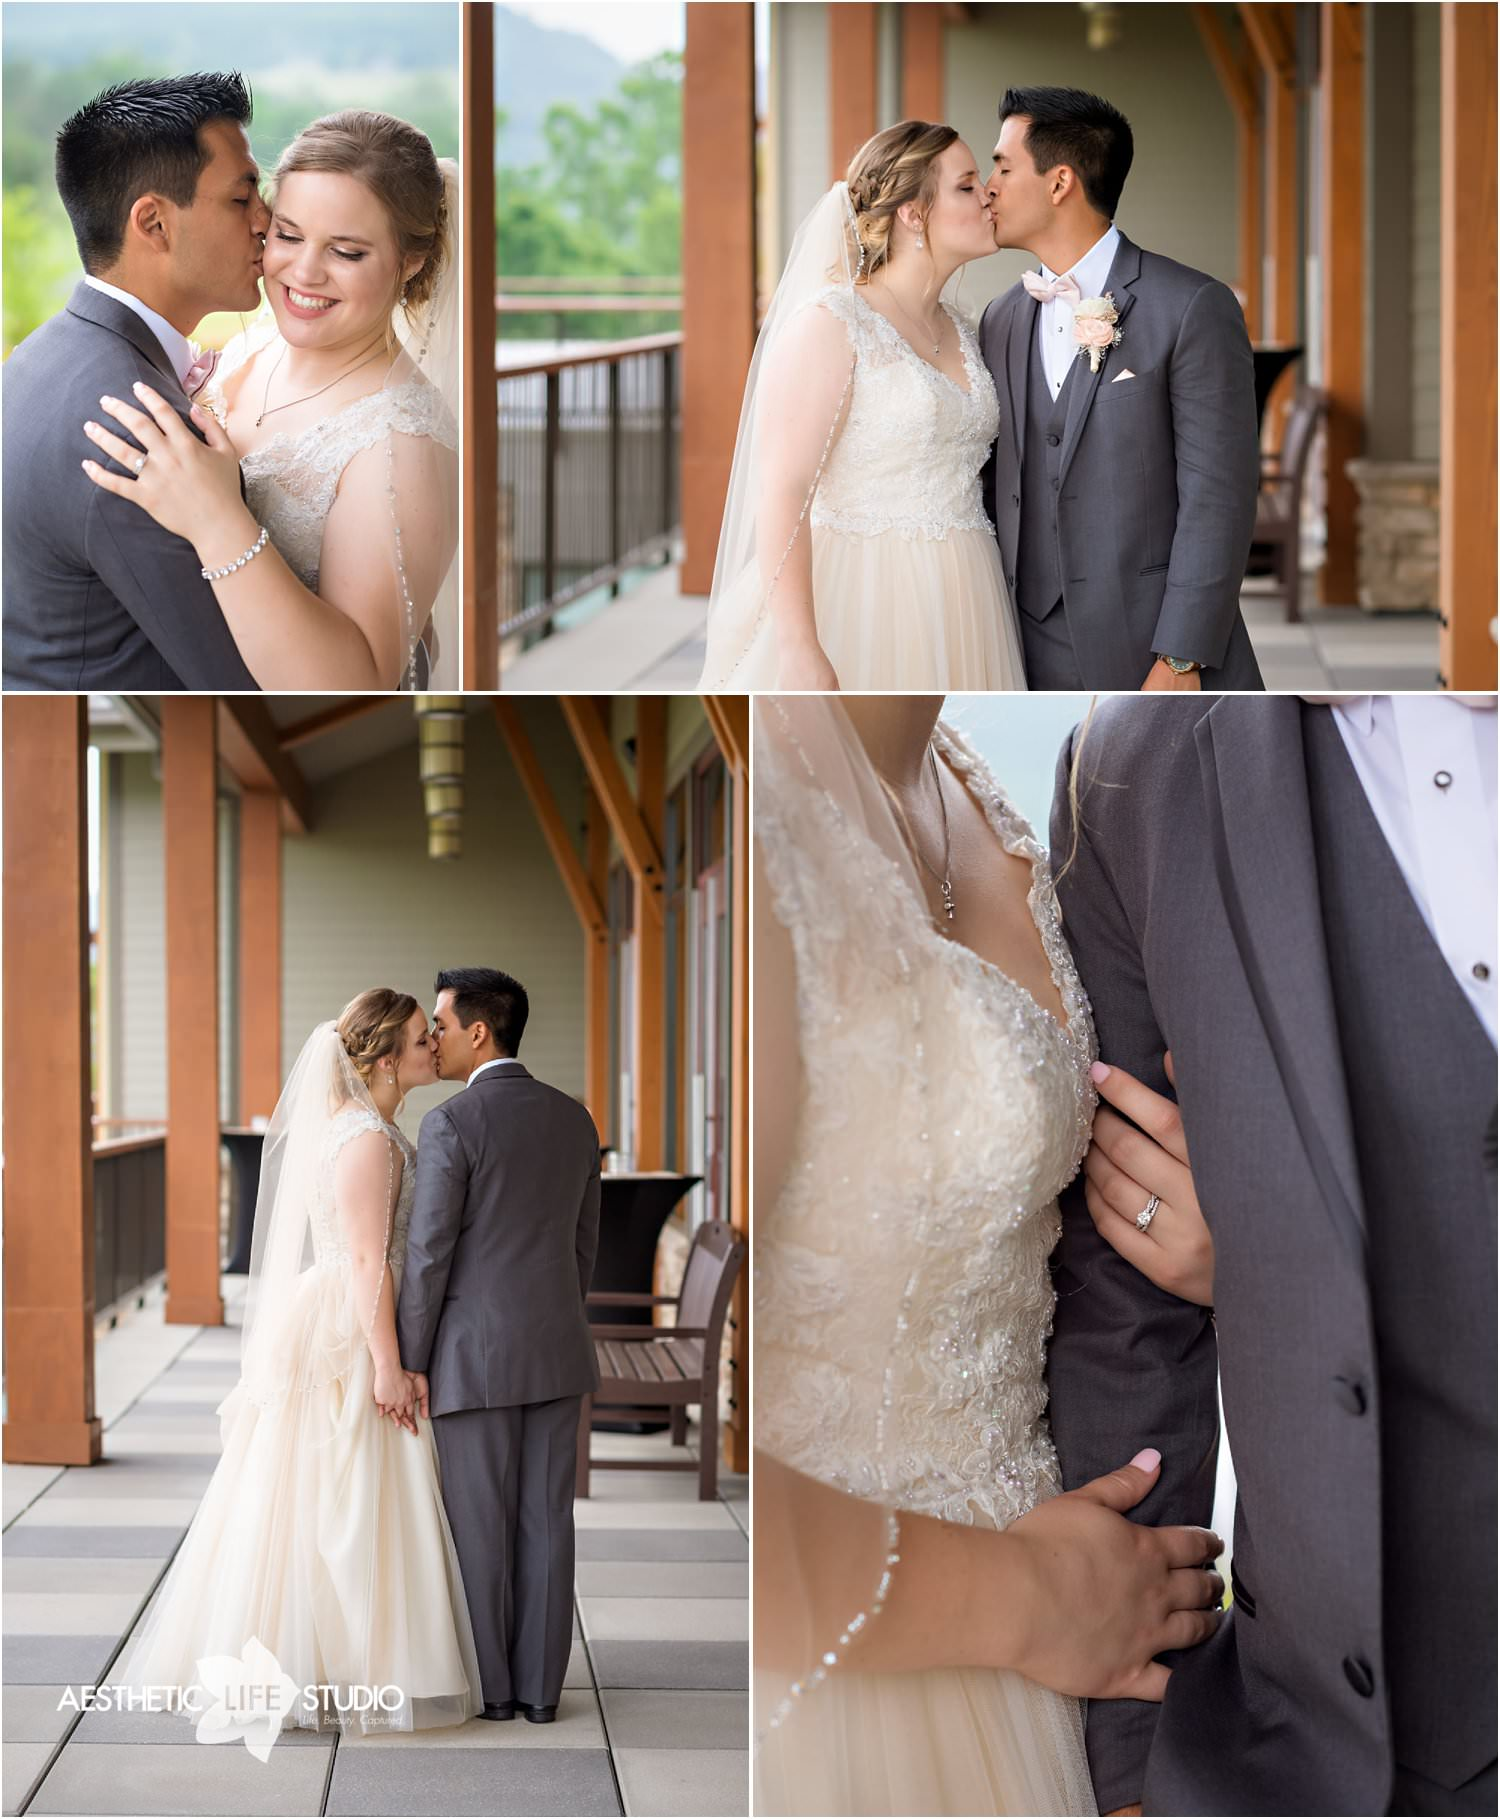 Highland Lodge Liberty Mountain Resort Wedding 019.jpg